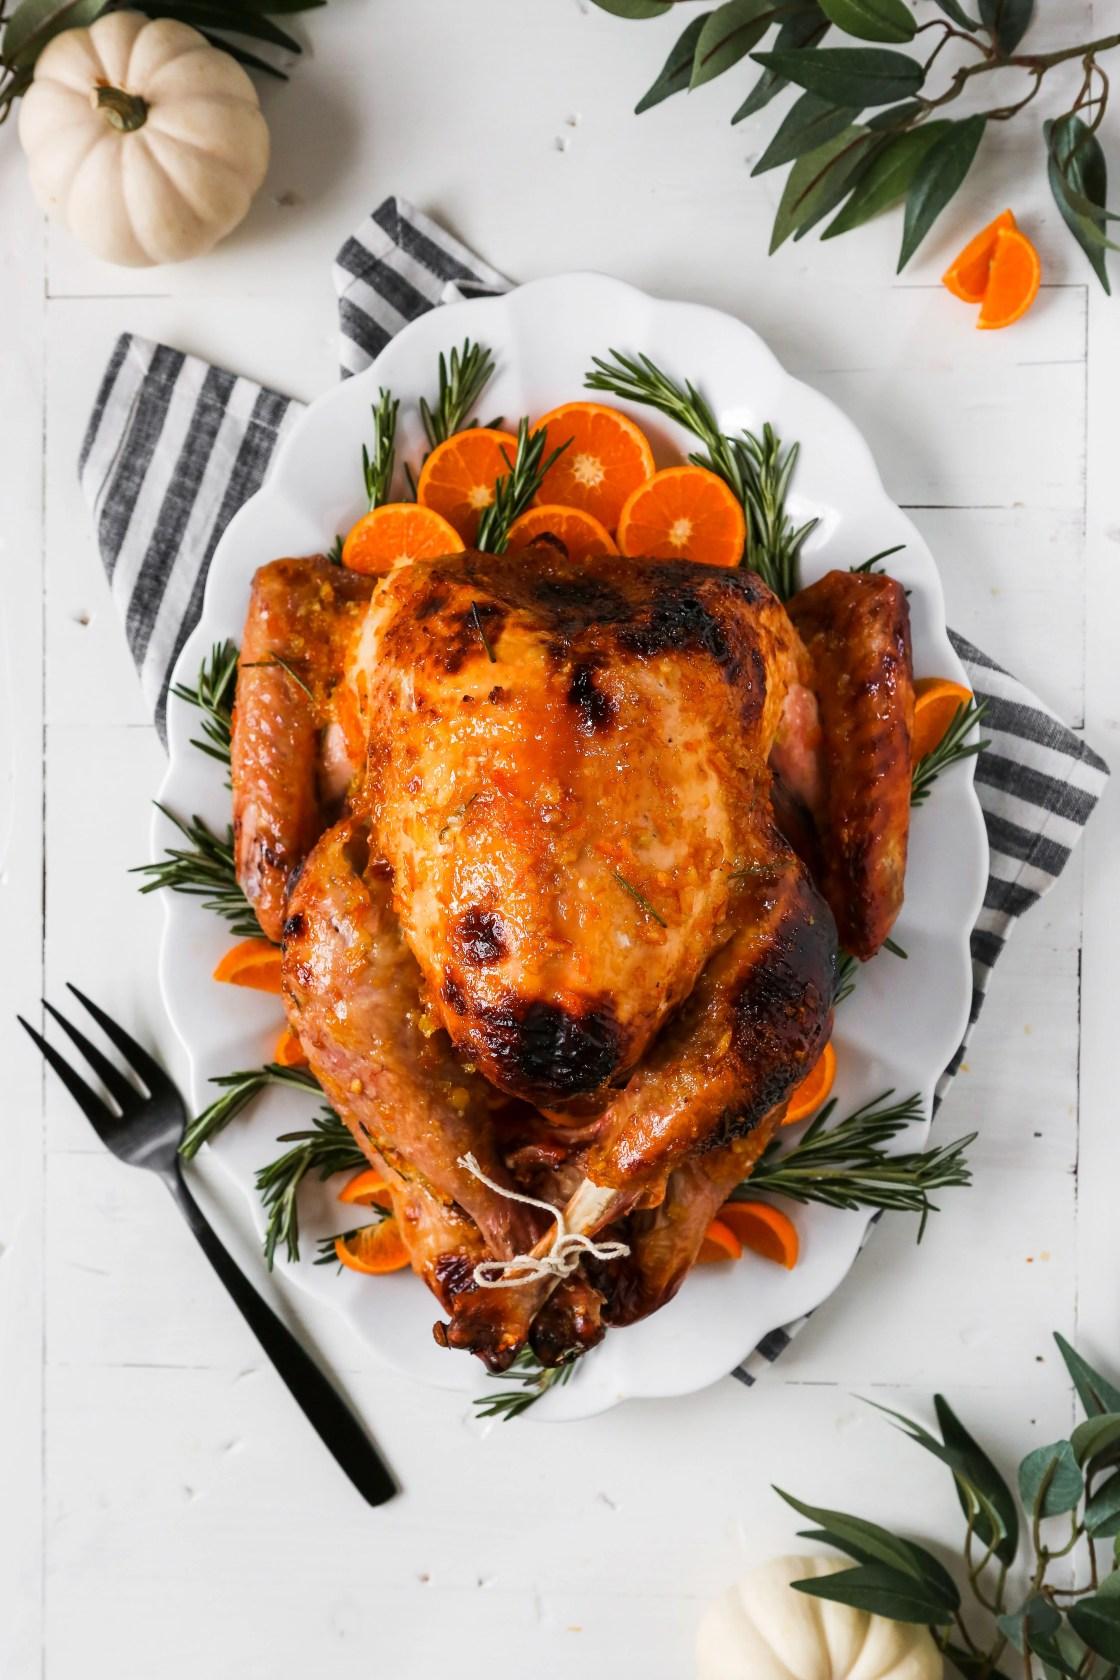 photograph of a whole glazed roast turkey on a large white platter